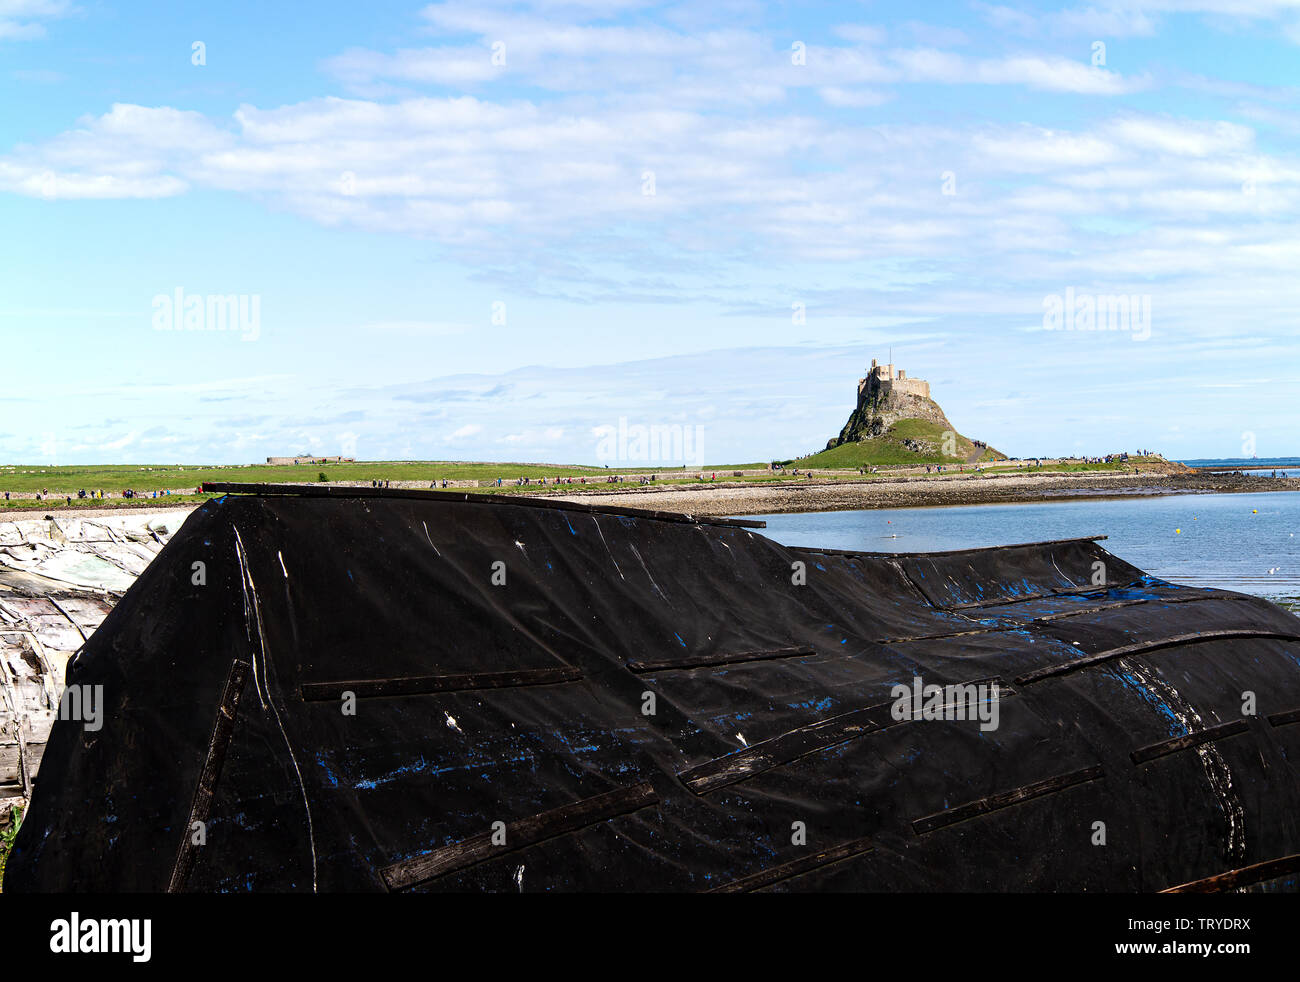 Old Upturned Fishing Boat Hulls Used as a Hut with Lindisfarne Castle on Holy Island Northumberland England United Kingdom UK Stock Photo